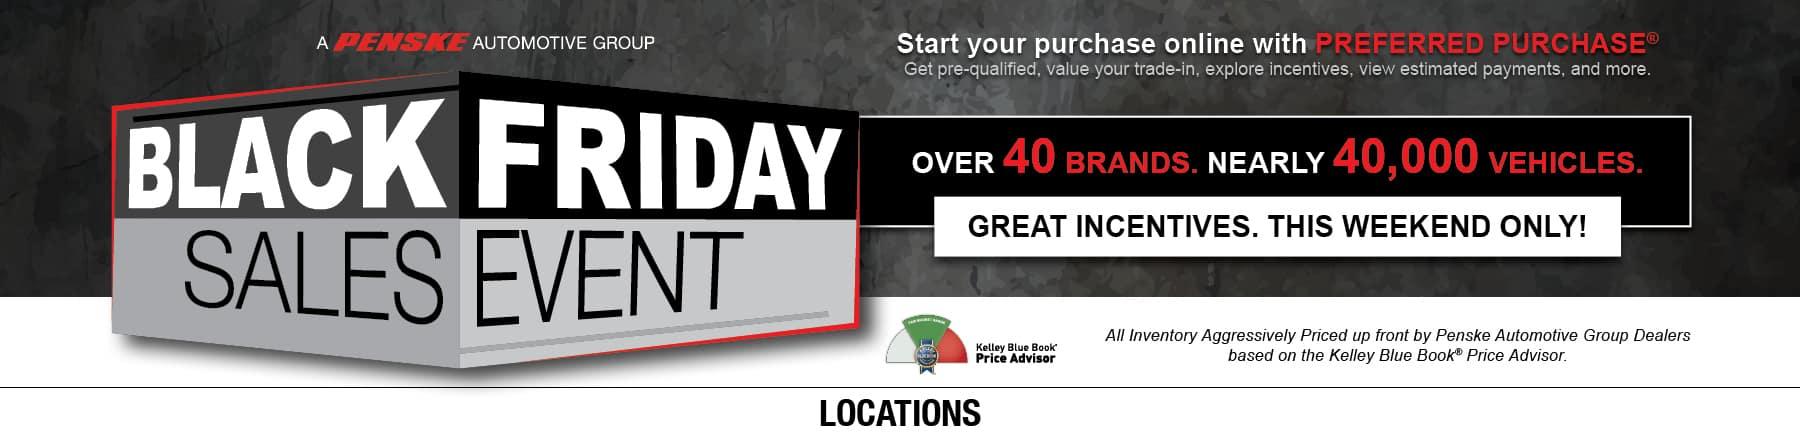 locations black friday